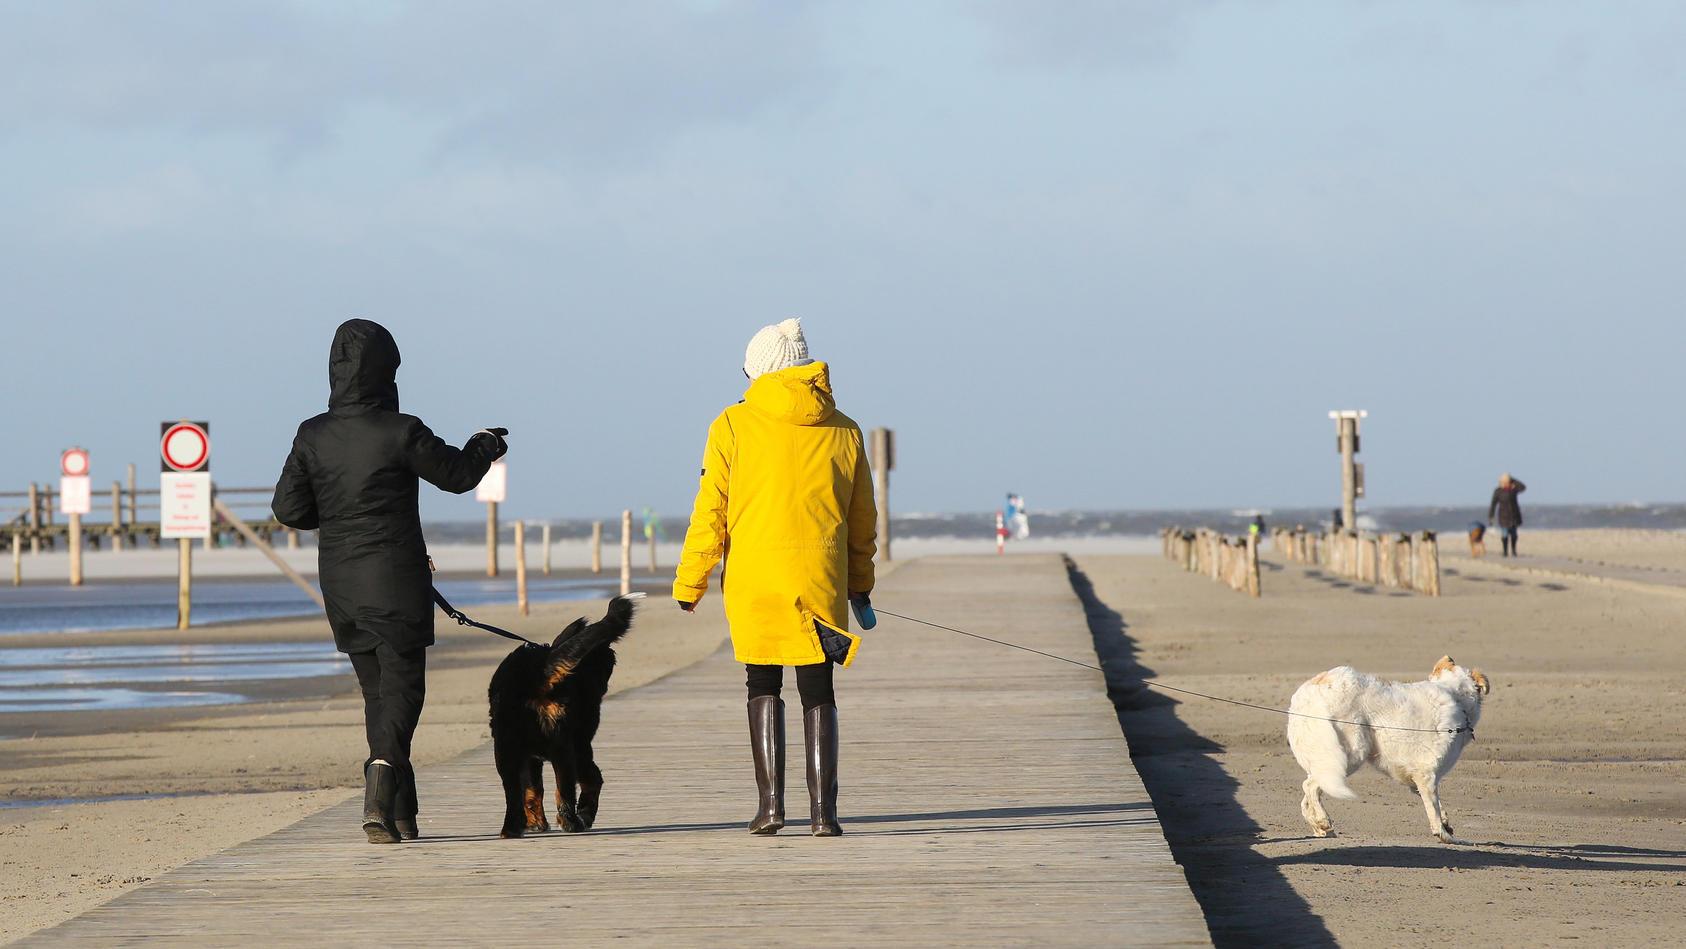 Spaziergang am Meer - Symbolbild